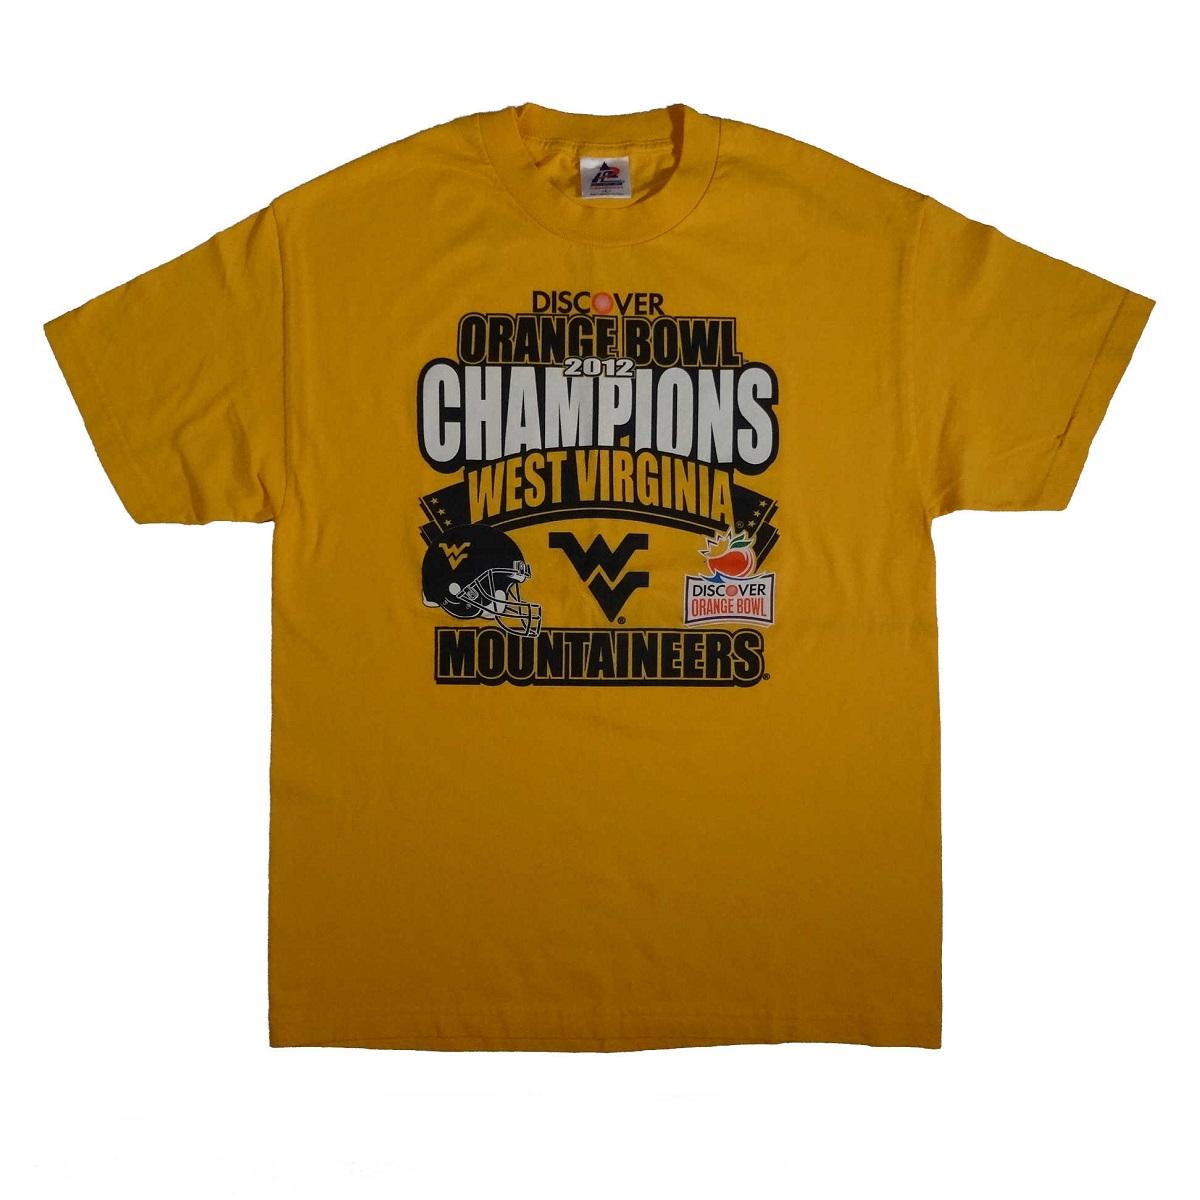 west virginia mountaineers 2012 orange bowl t shirt front